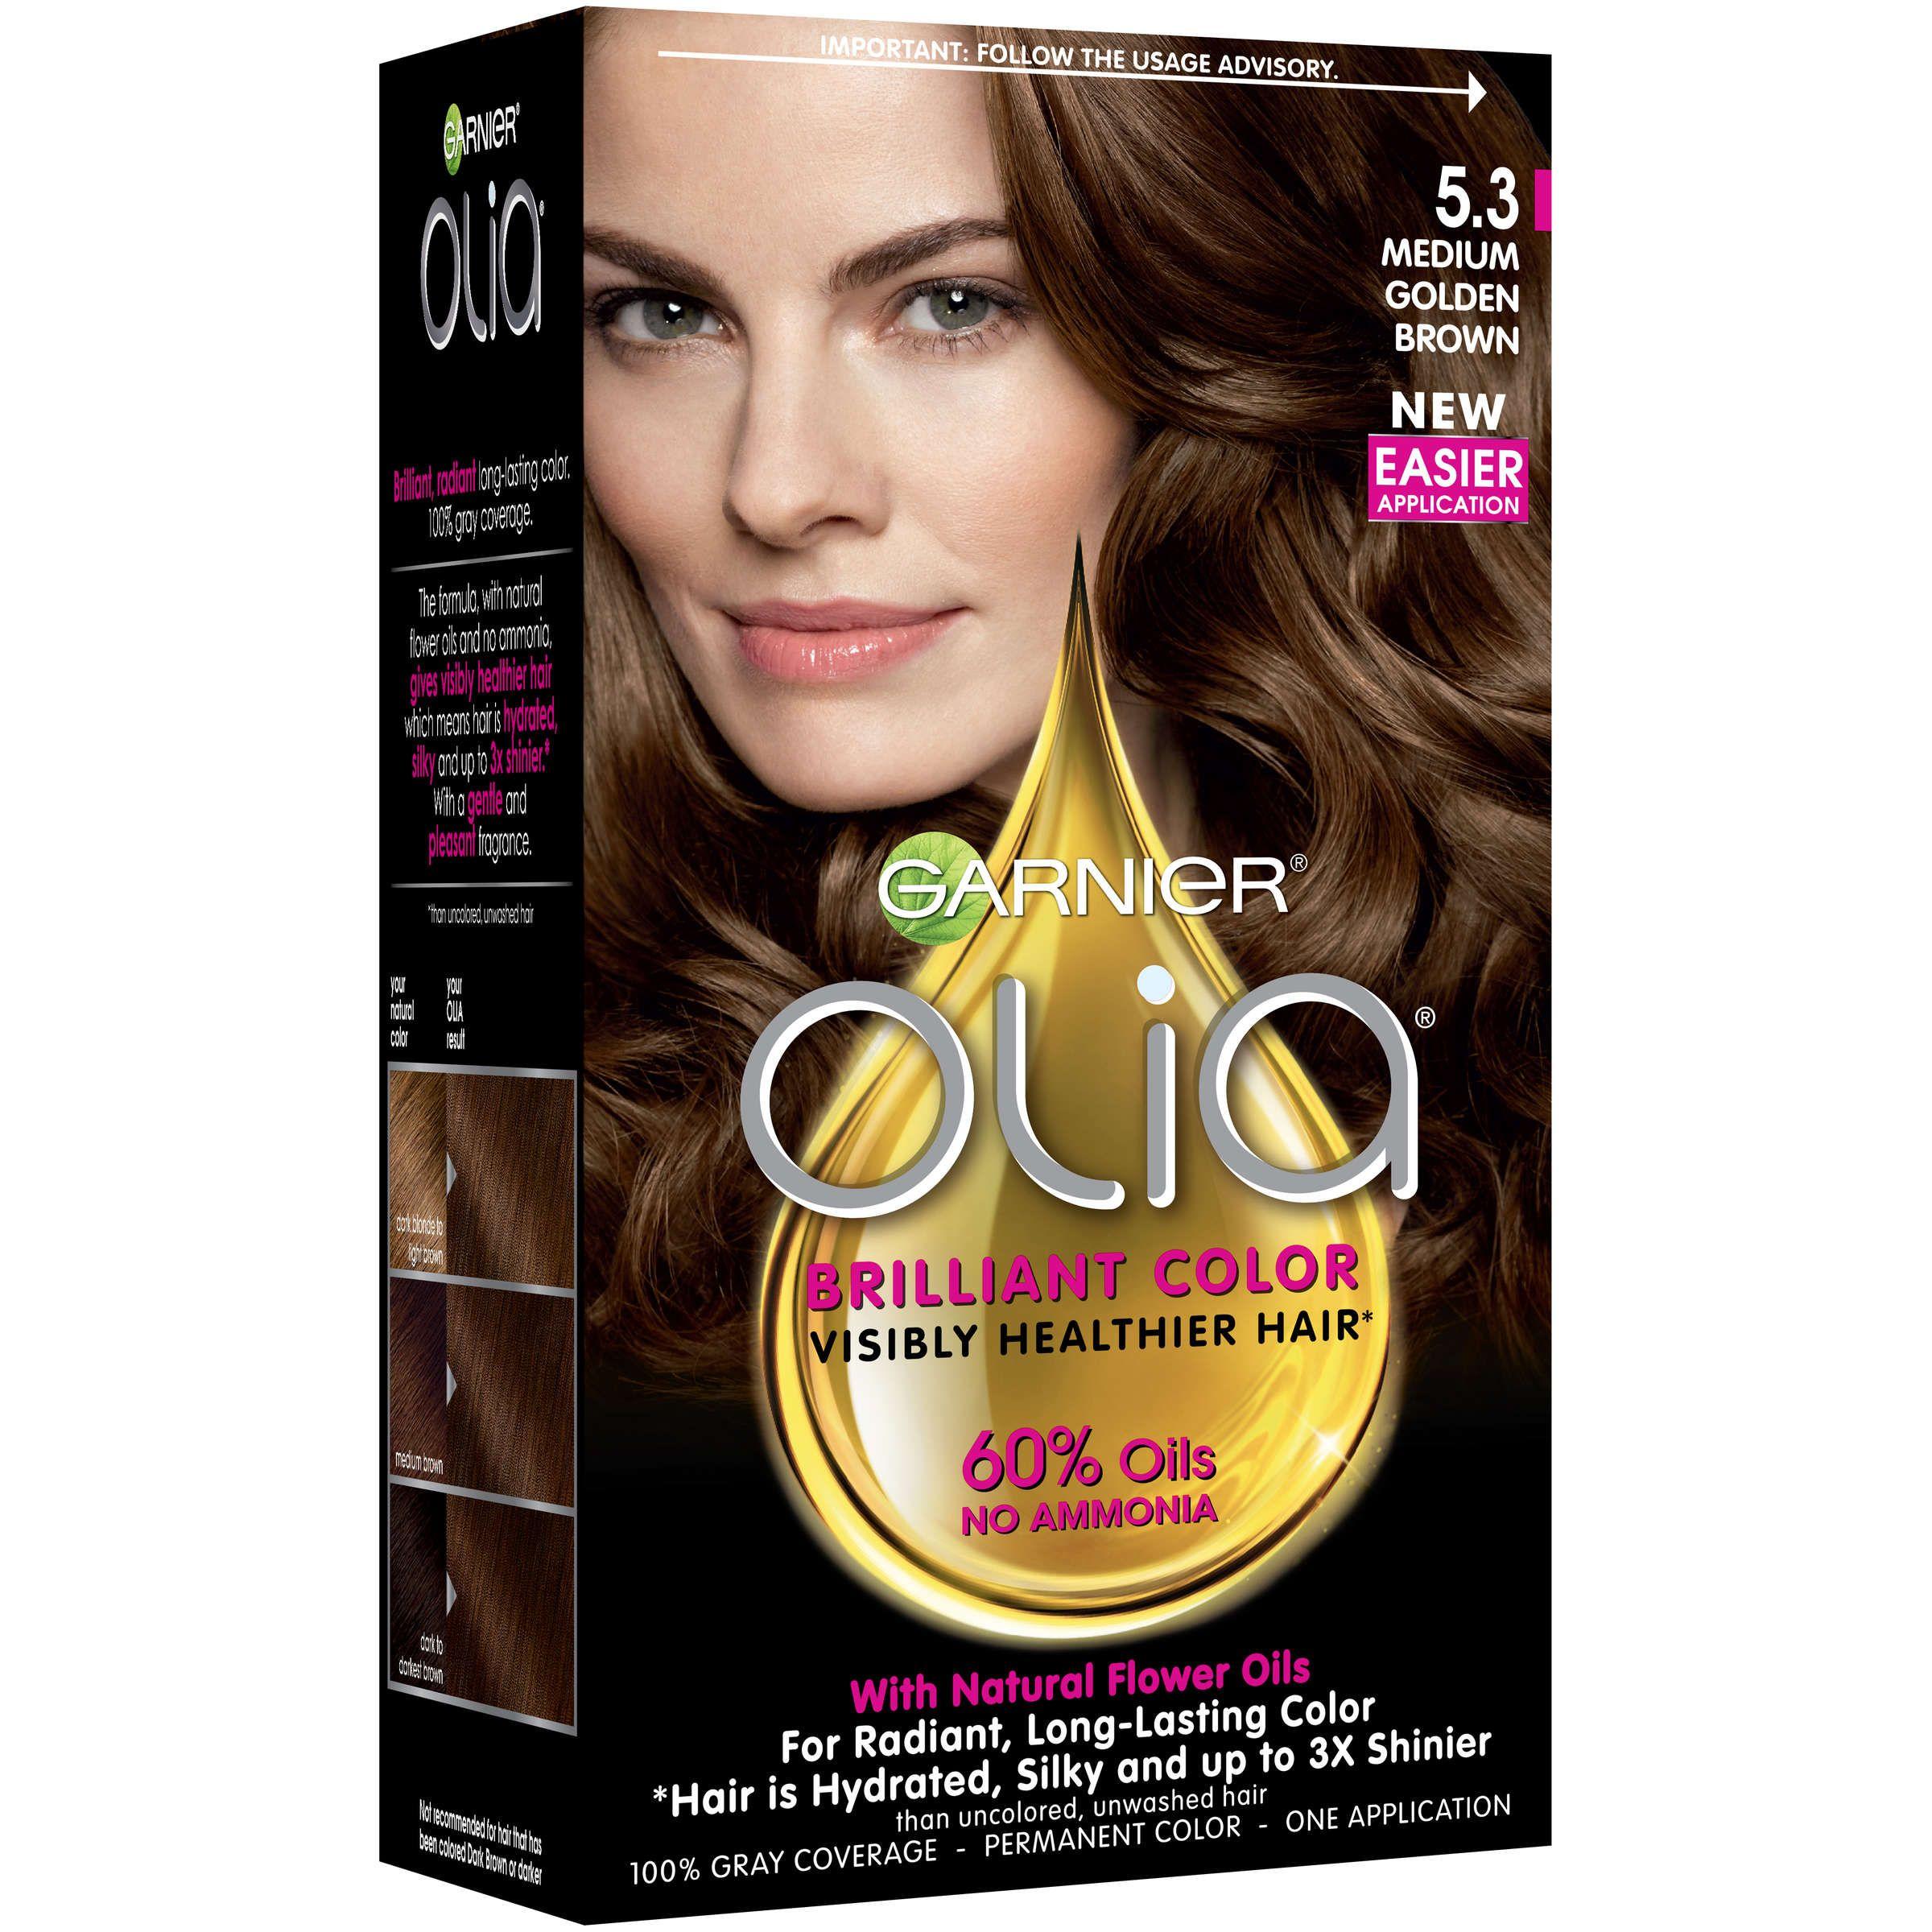 Garnier Olia Oil Powered Permanent Hair Color 6 0 Light Brown Powered Permanent Oil Hoeden